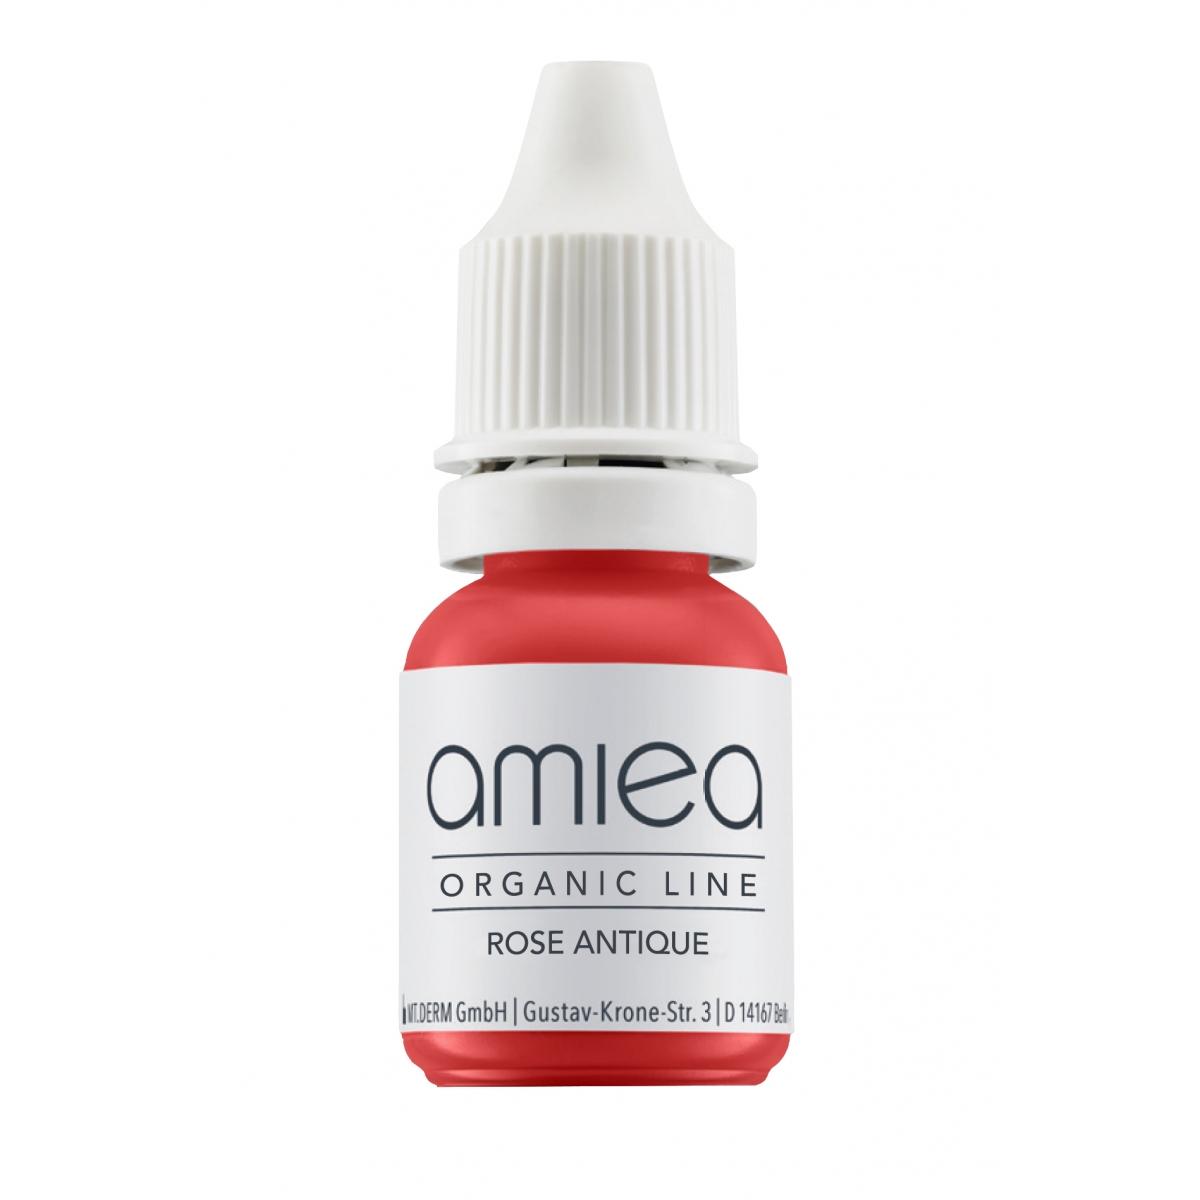 ORGANIC LINE (10ml) - PIGMENT ROSE ANTIQUE ORGANICLINE AMIEA (10 ml)